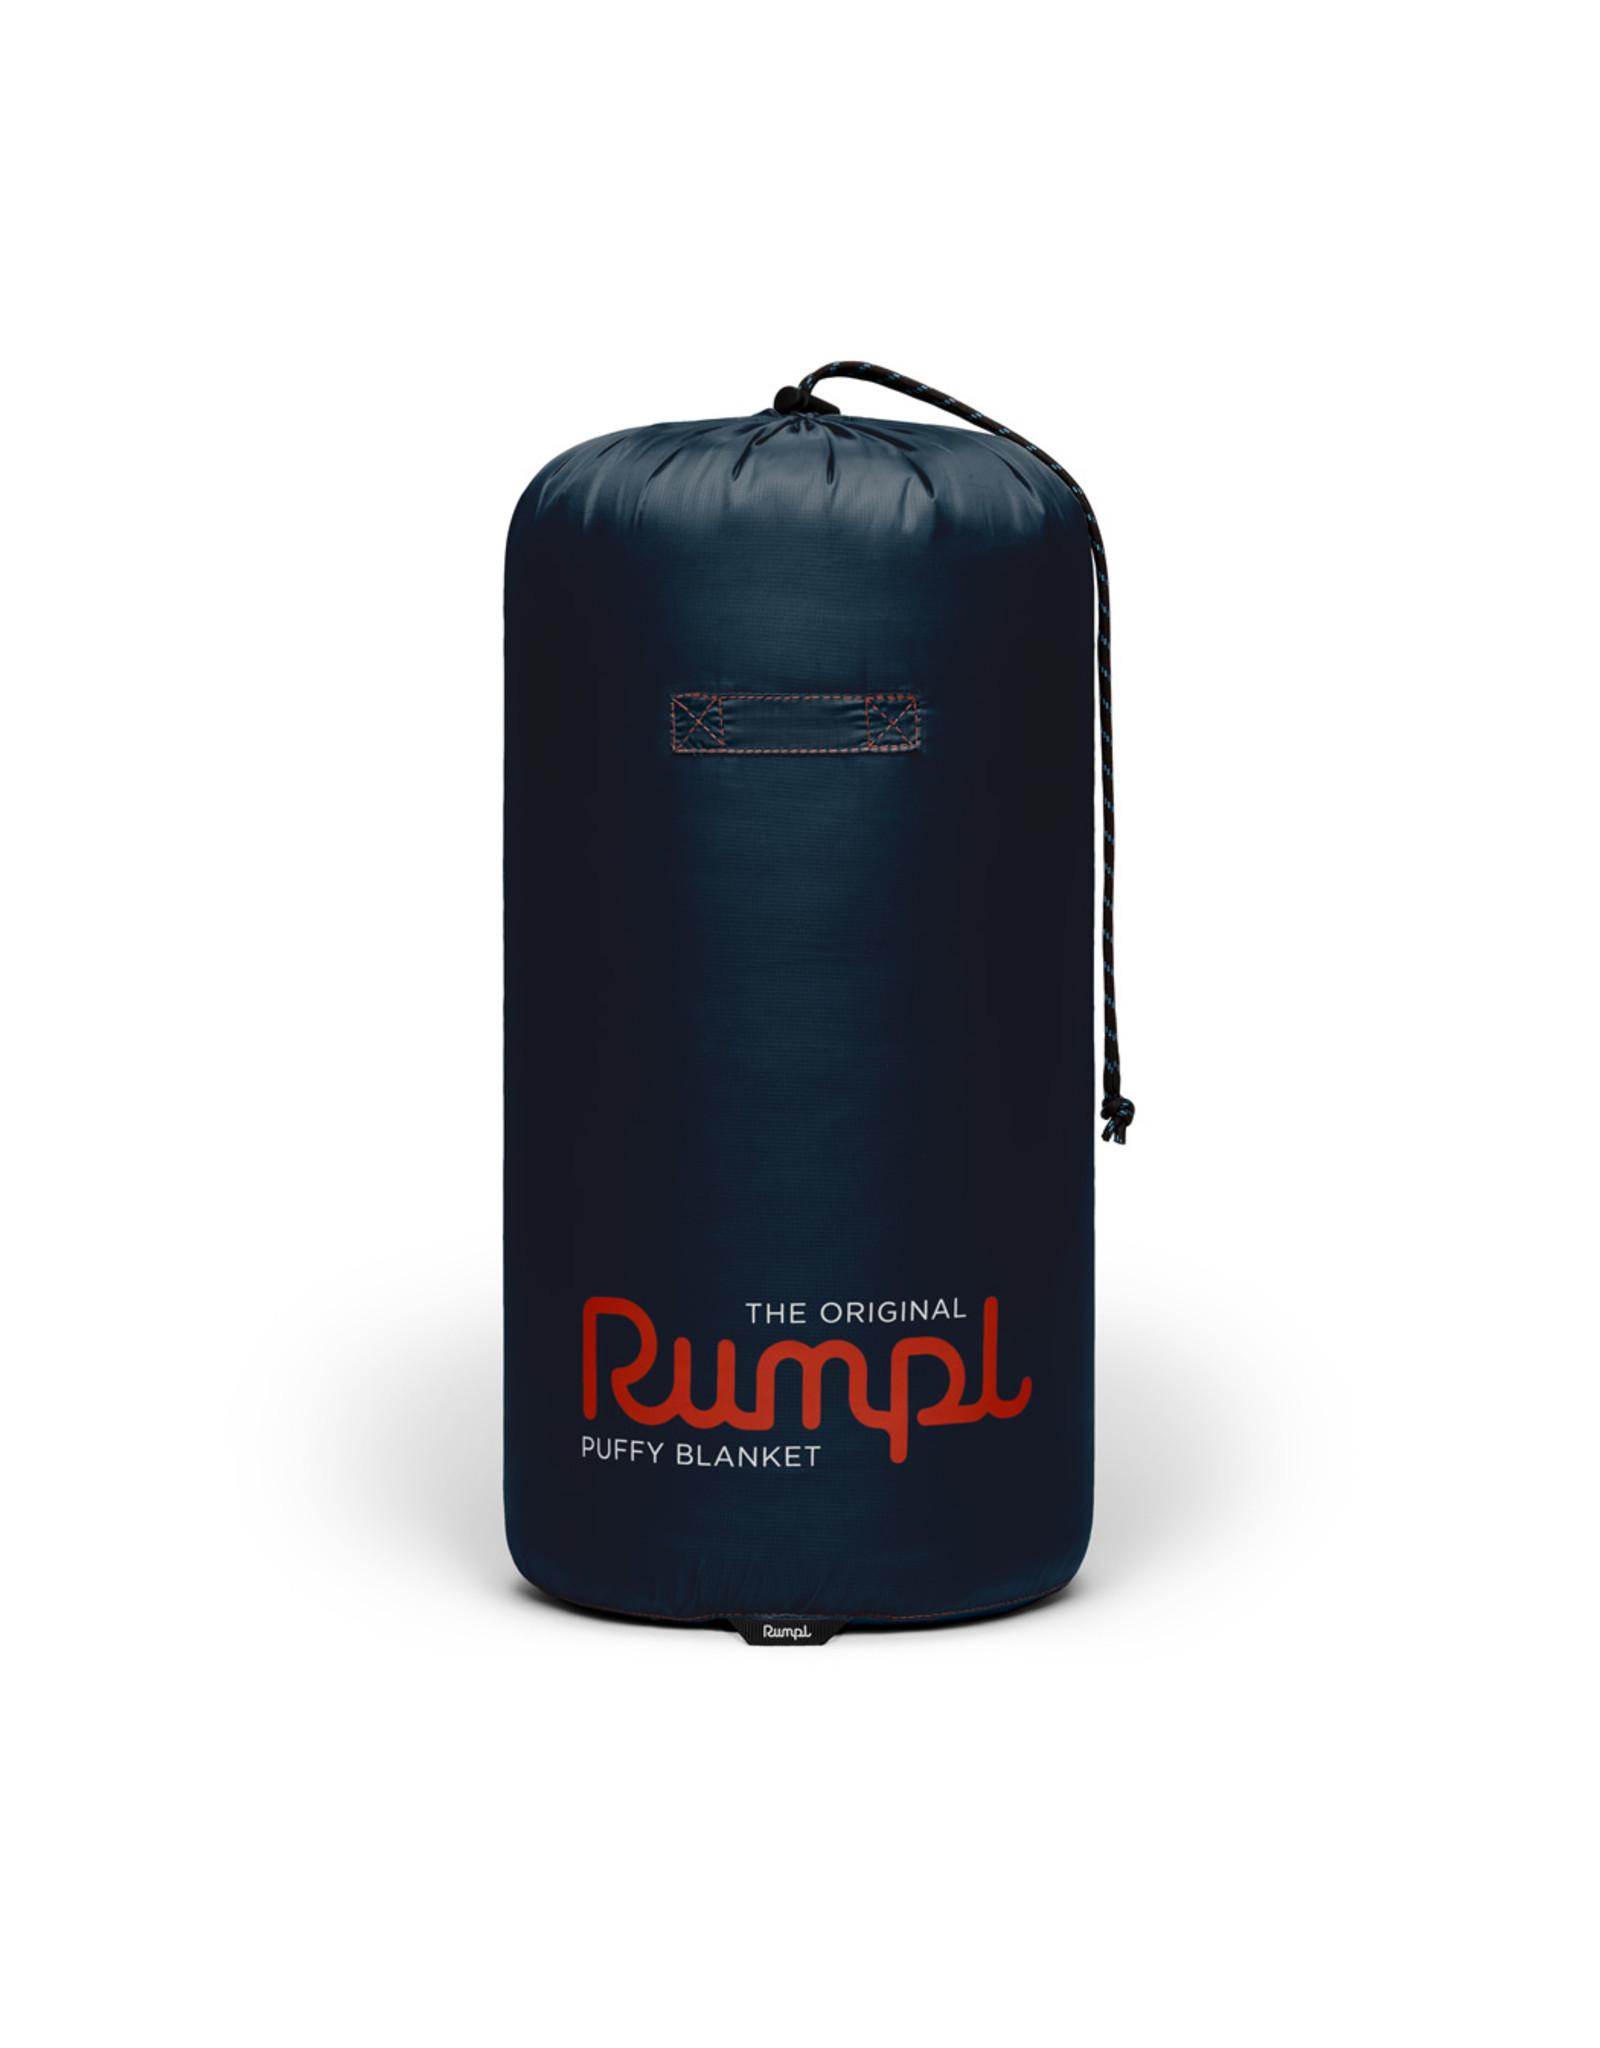 RUMPL RUMPL ORIGINAL SOLID PUFFY BLANKET- 2 PERSON-DEEPWATER